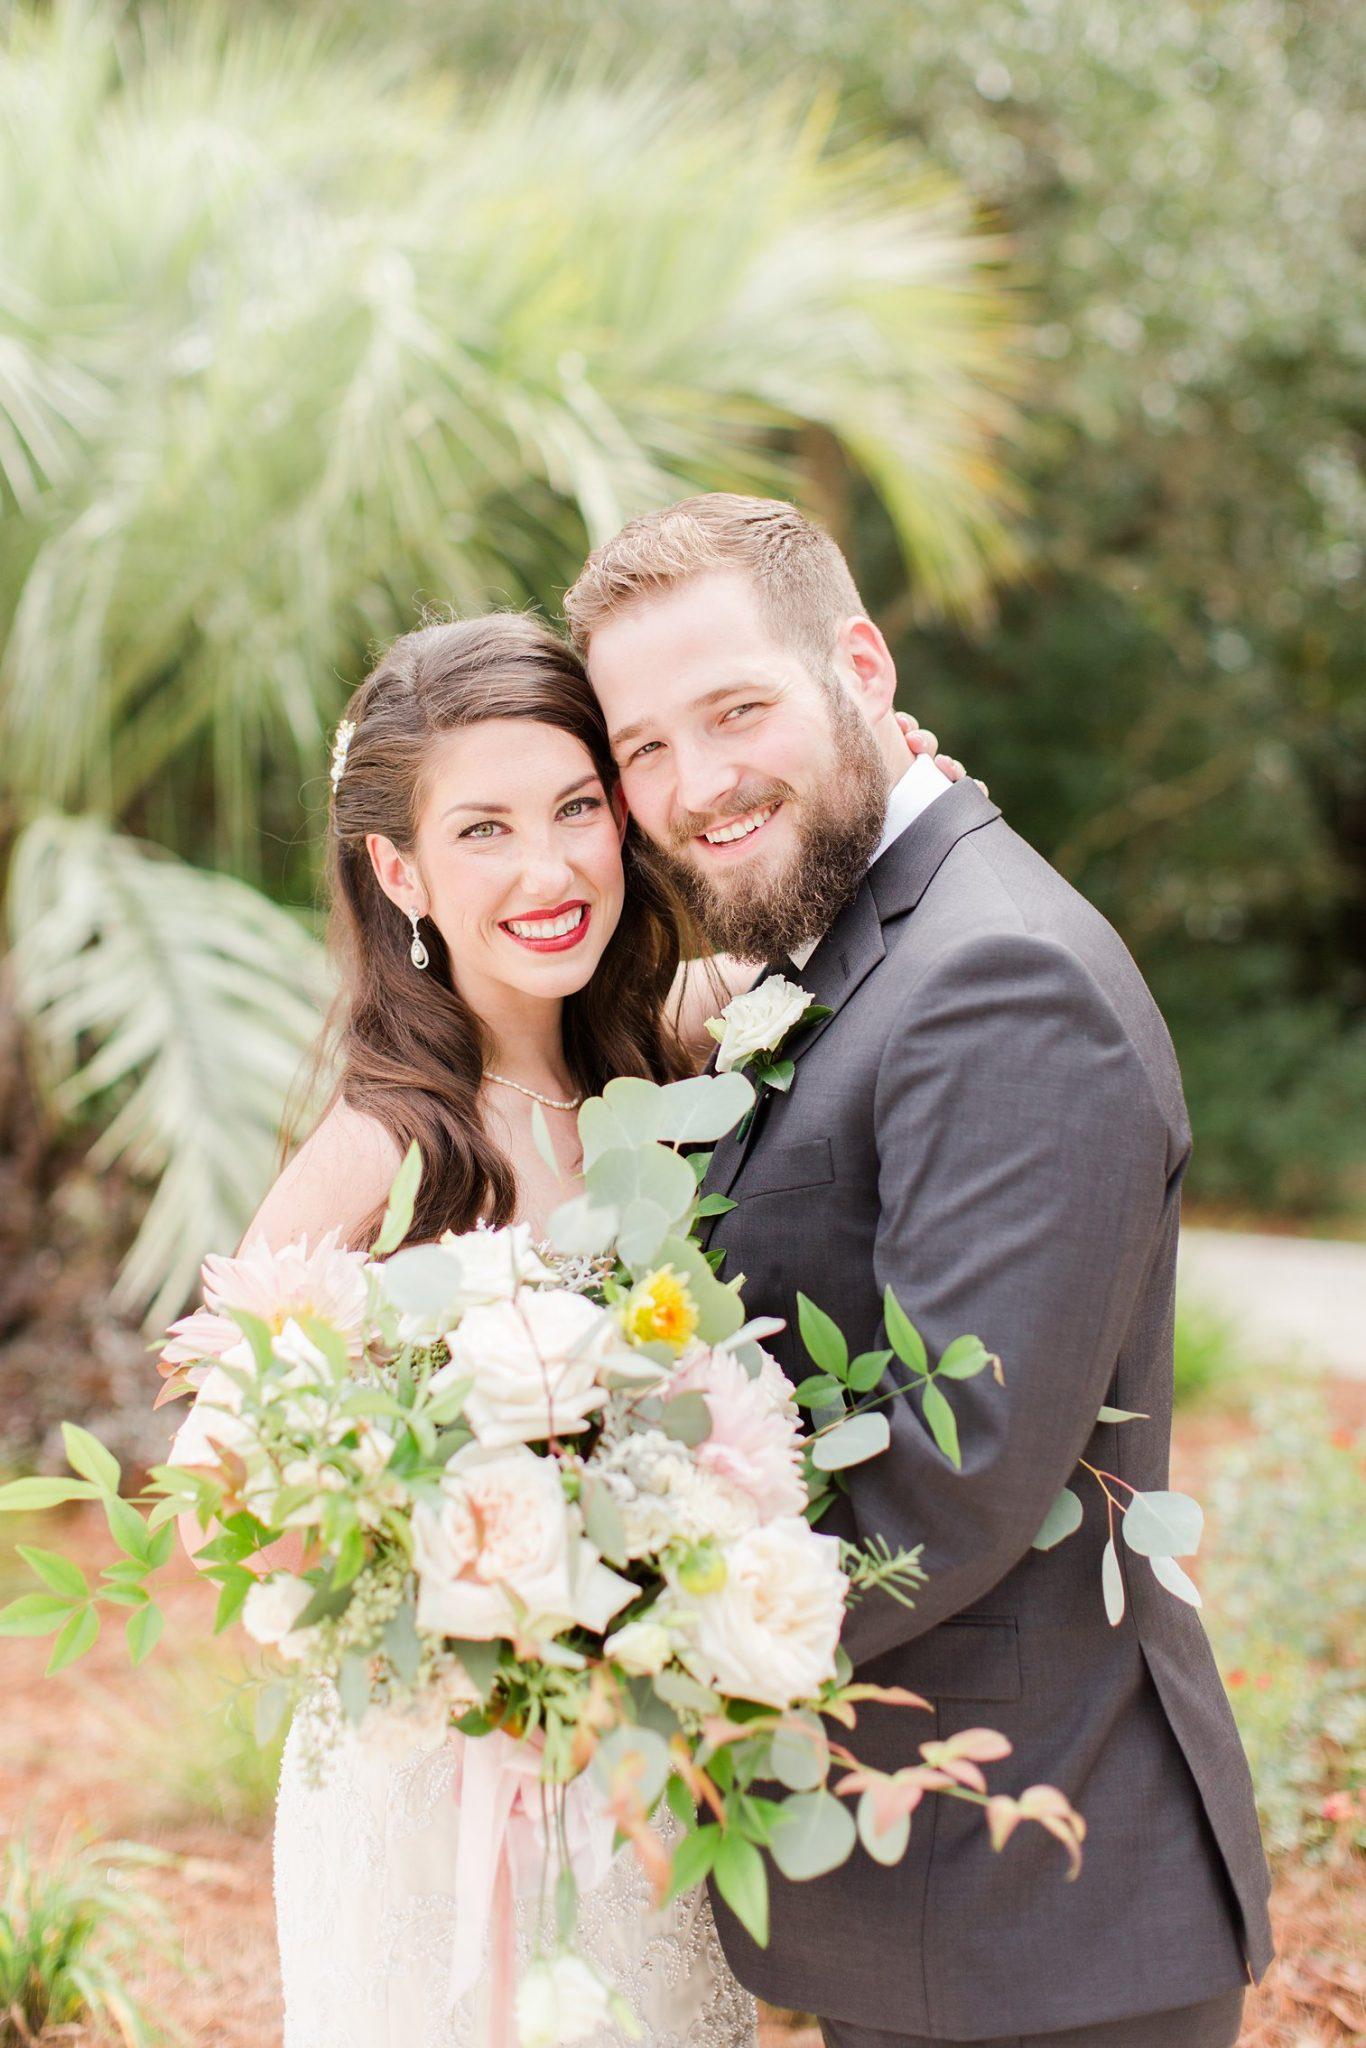 wedding day-bride and groom-portraits-photos-pure joy